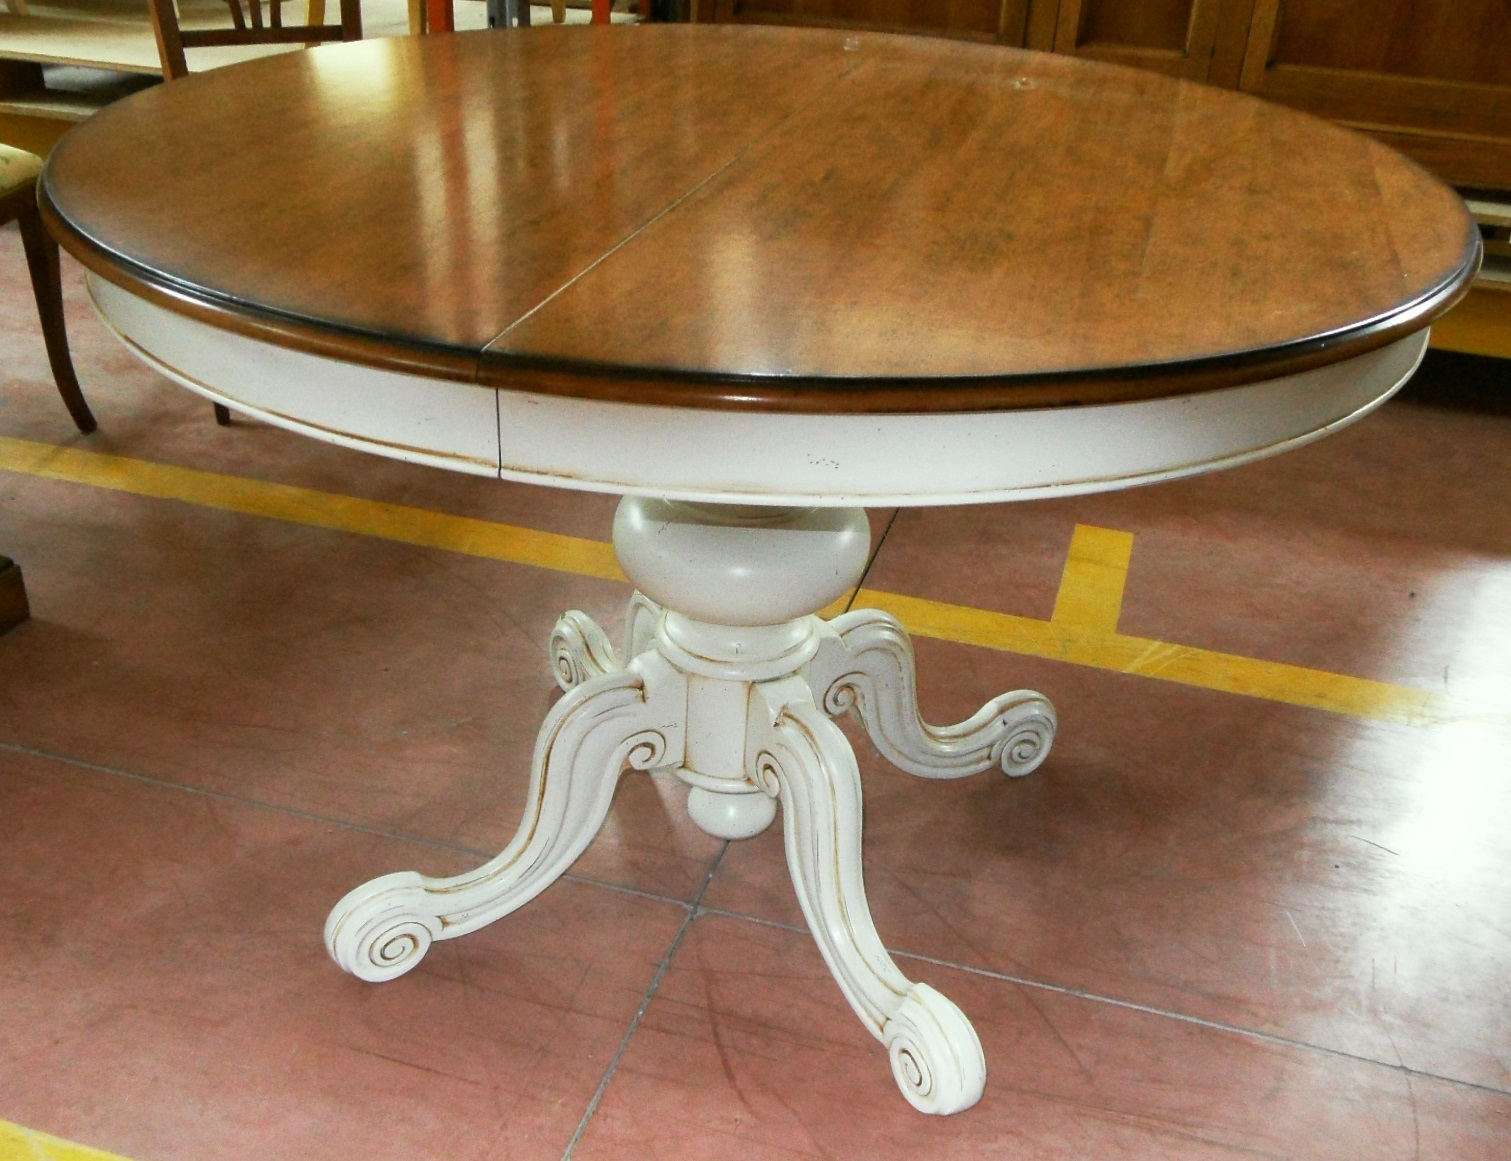 Tavolo rotondo allungabile scontato del 50 tavoli a prezzi scontati - Tavolo rotondo bianco allungabile ...